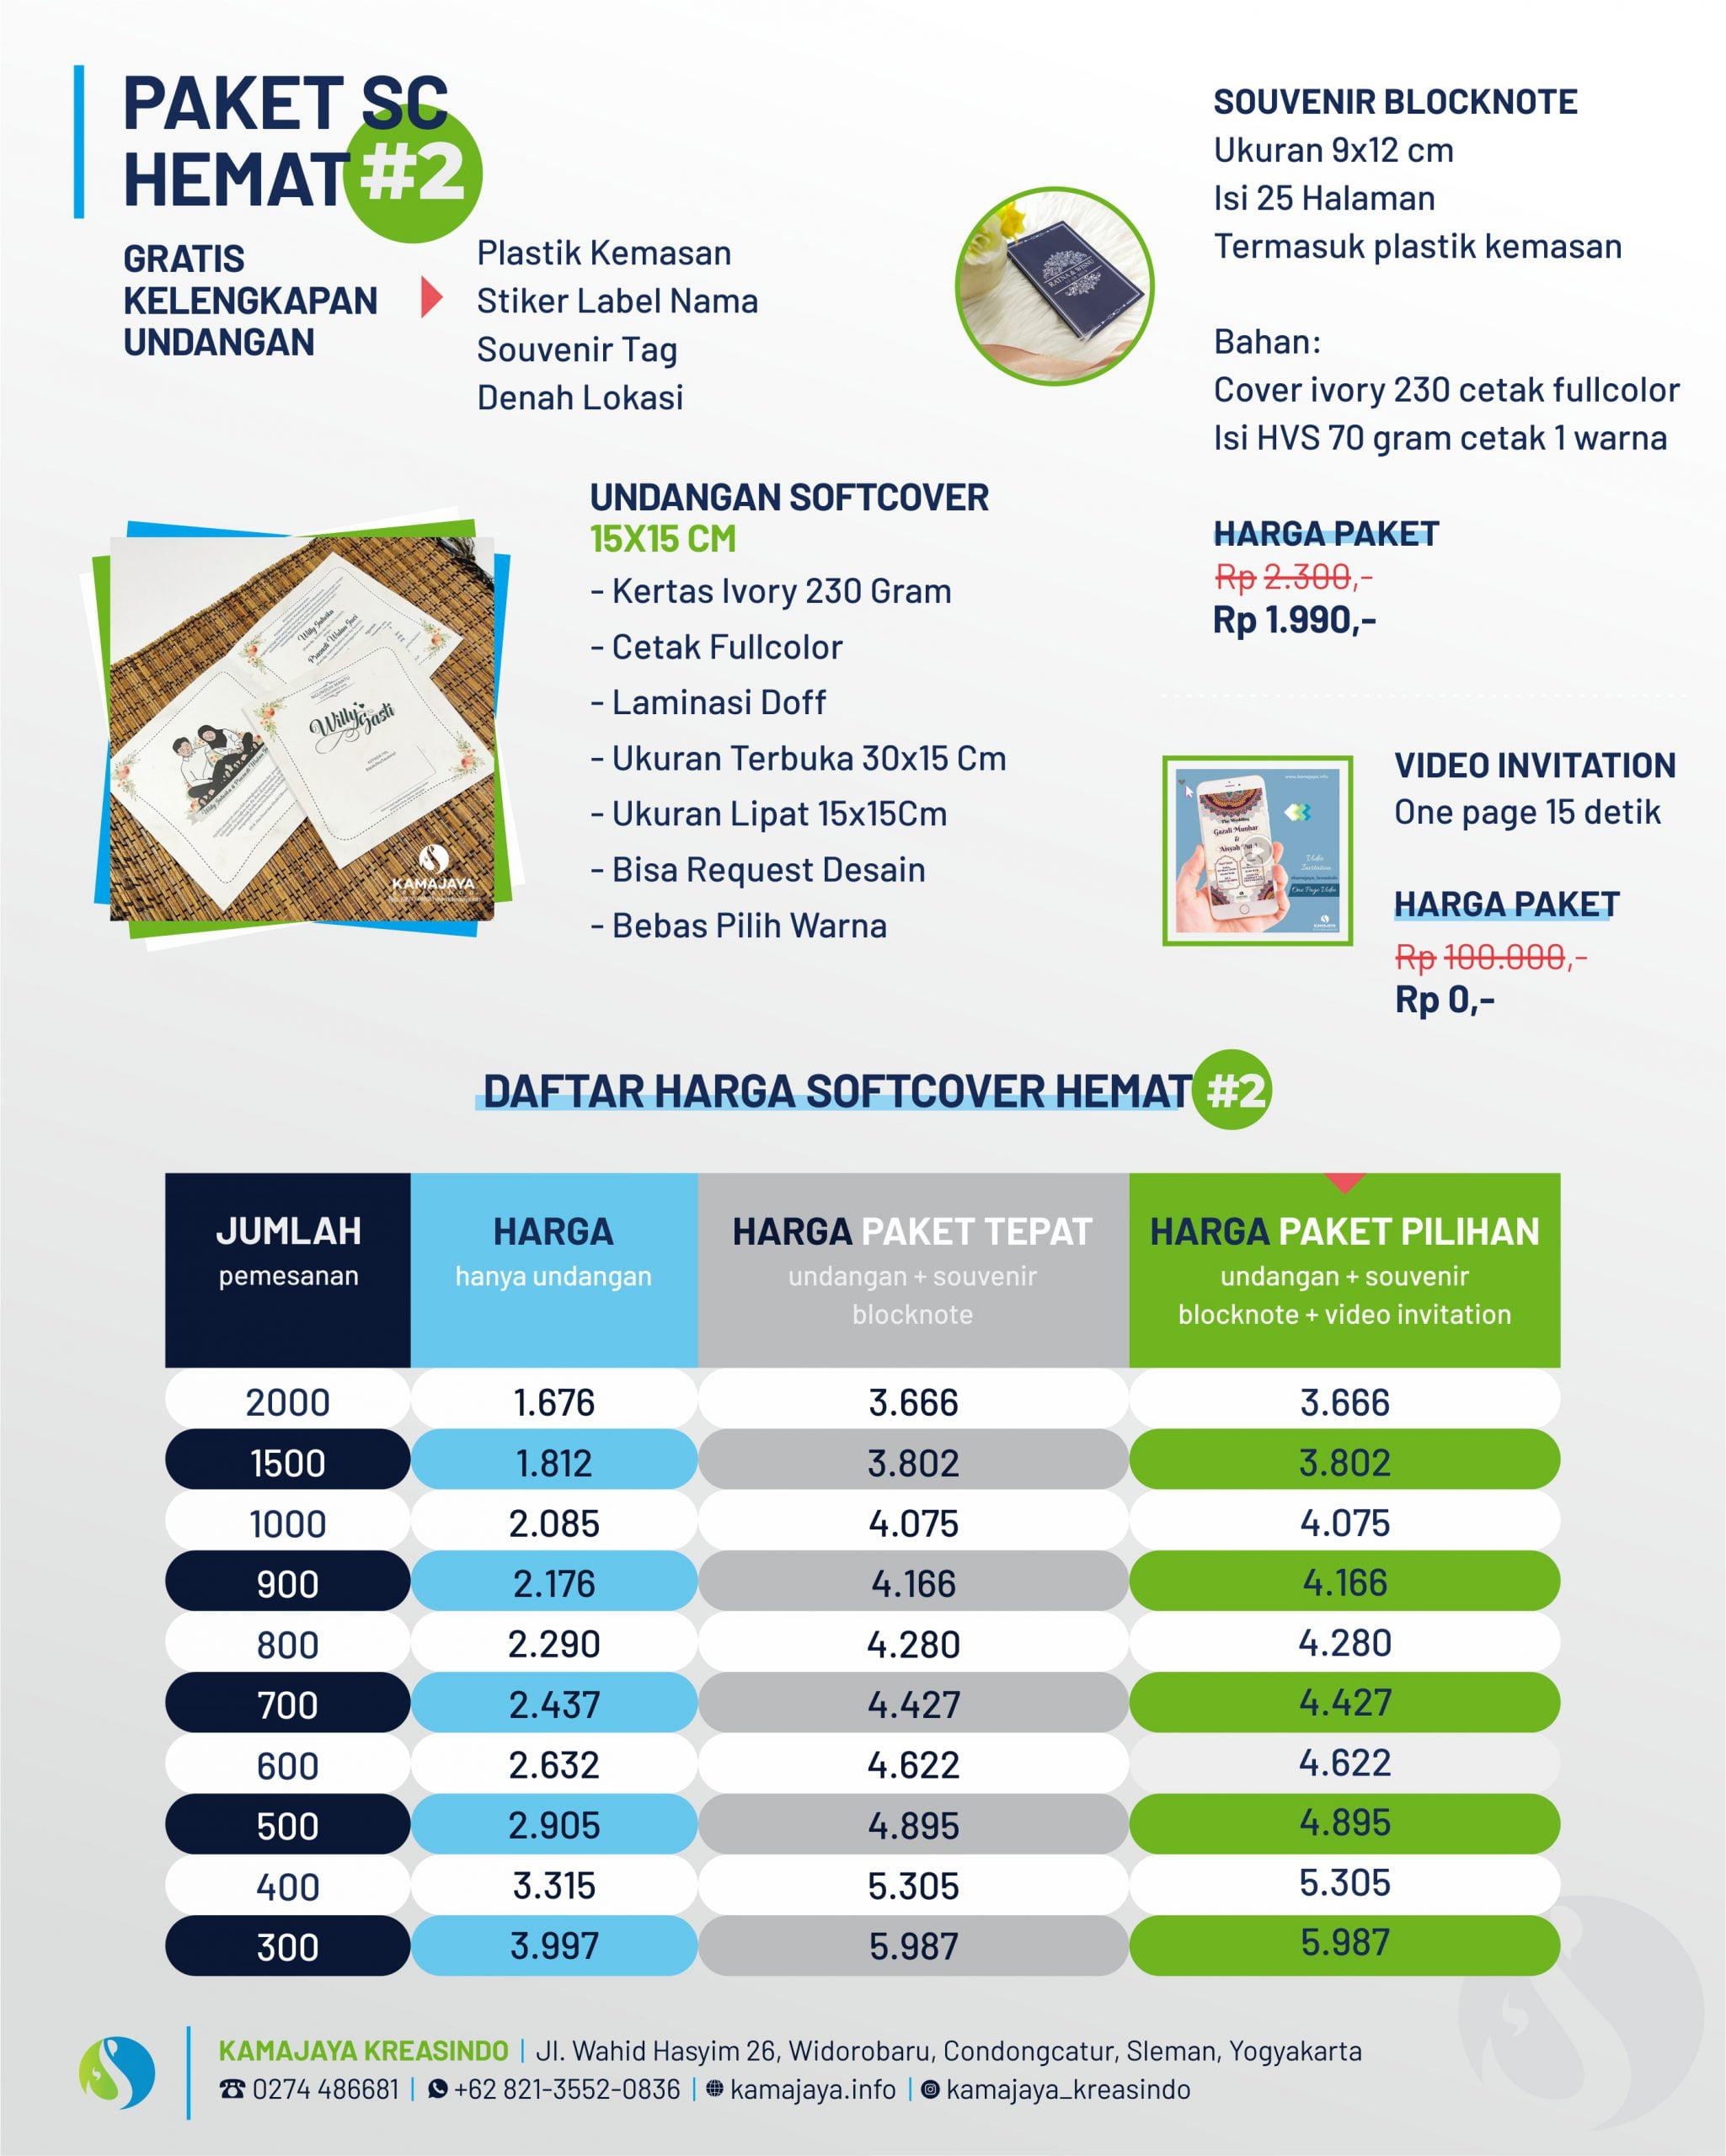 Daftar Harga Paket Undangan + Souvenir Blocknote